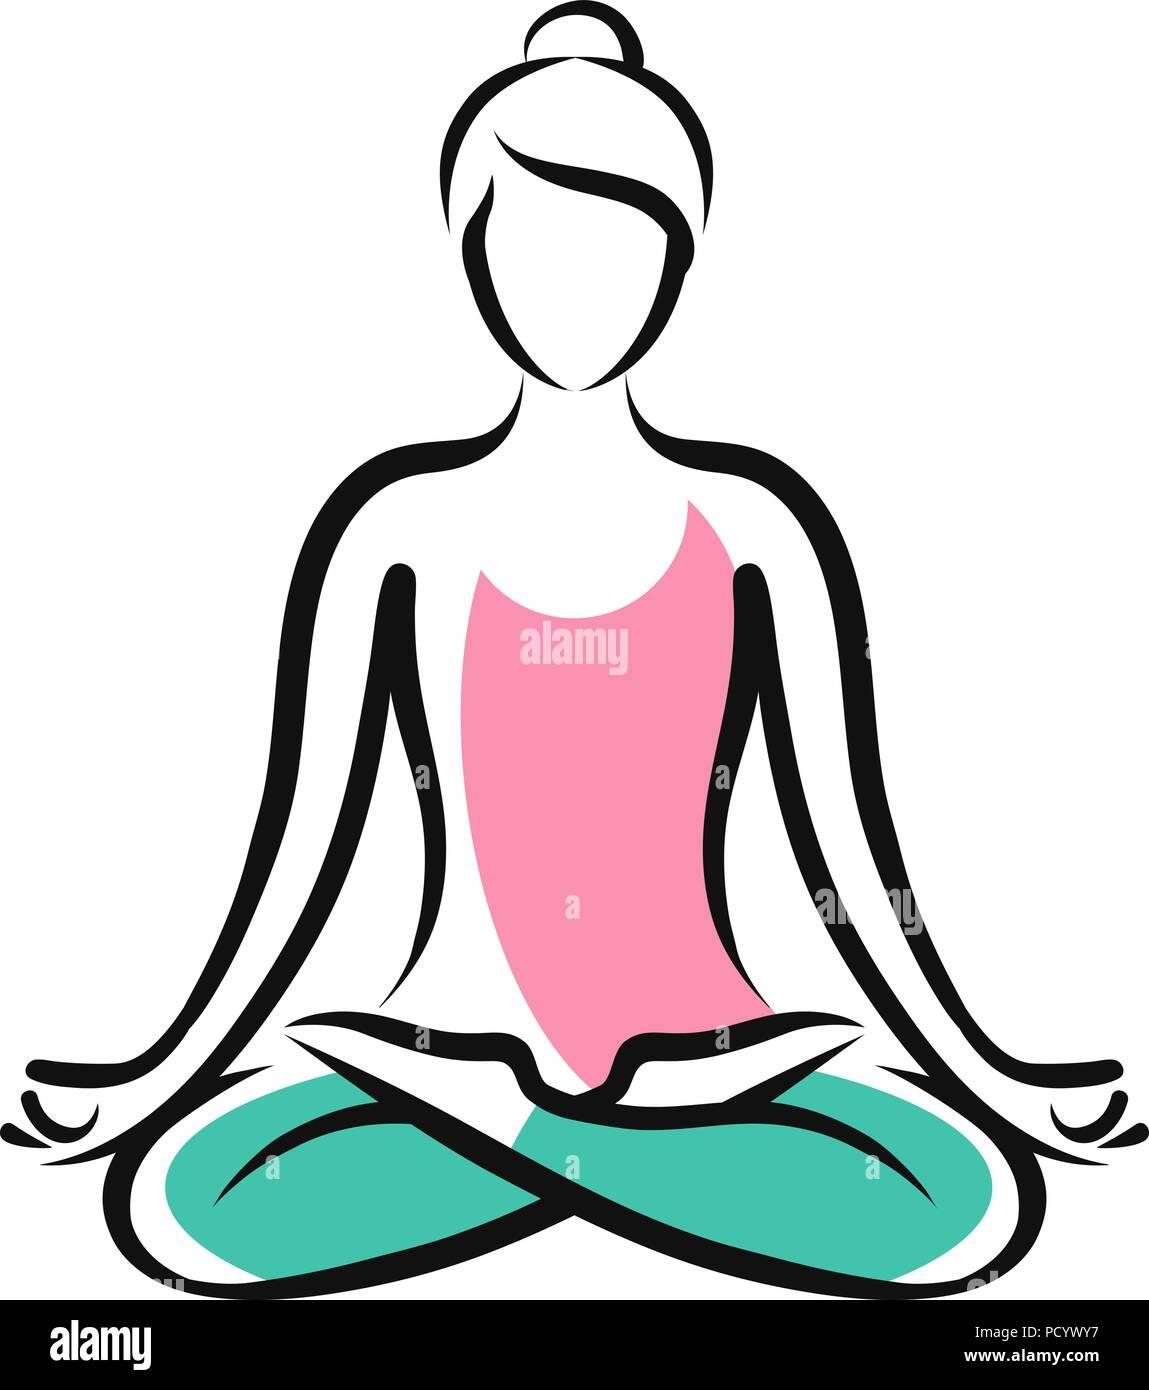 Girl sitting in lotus pose. Yoga, fitness logo or symbol. Vector illustration - Stock Vector